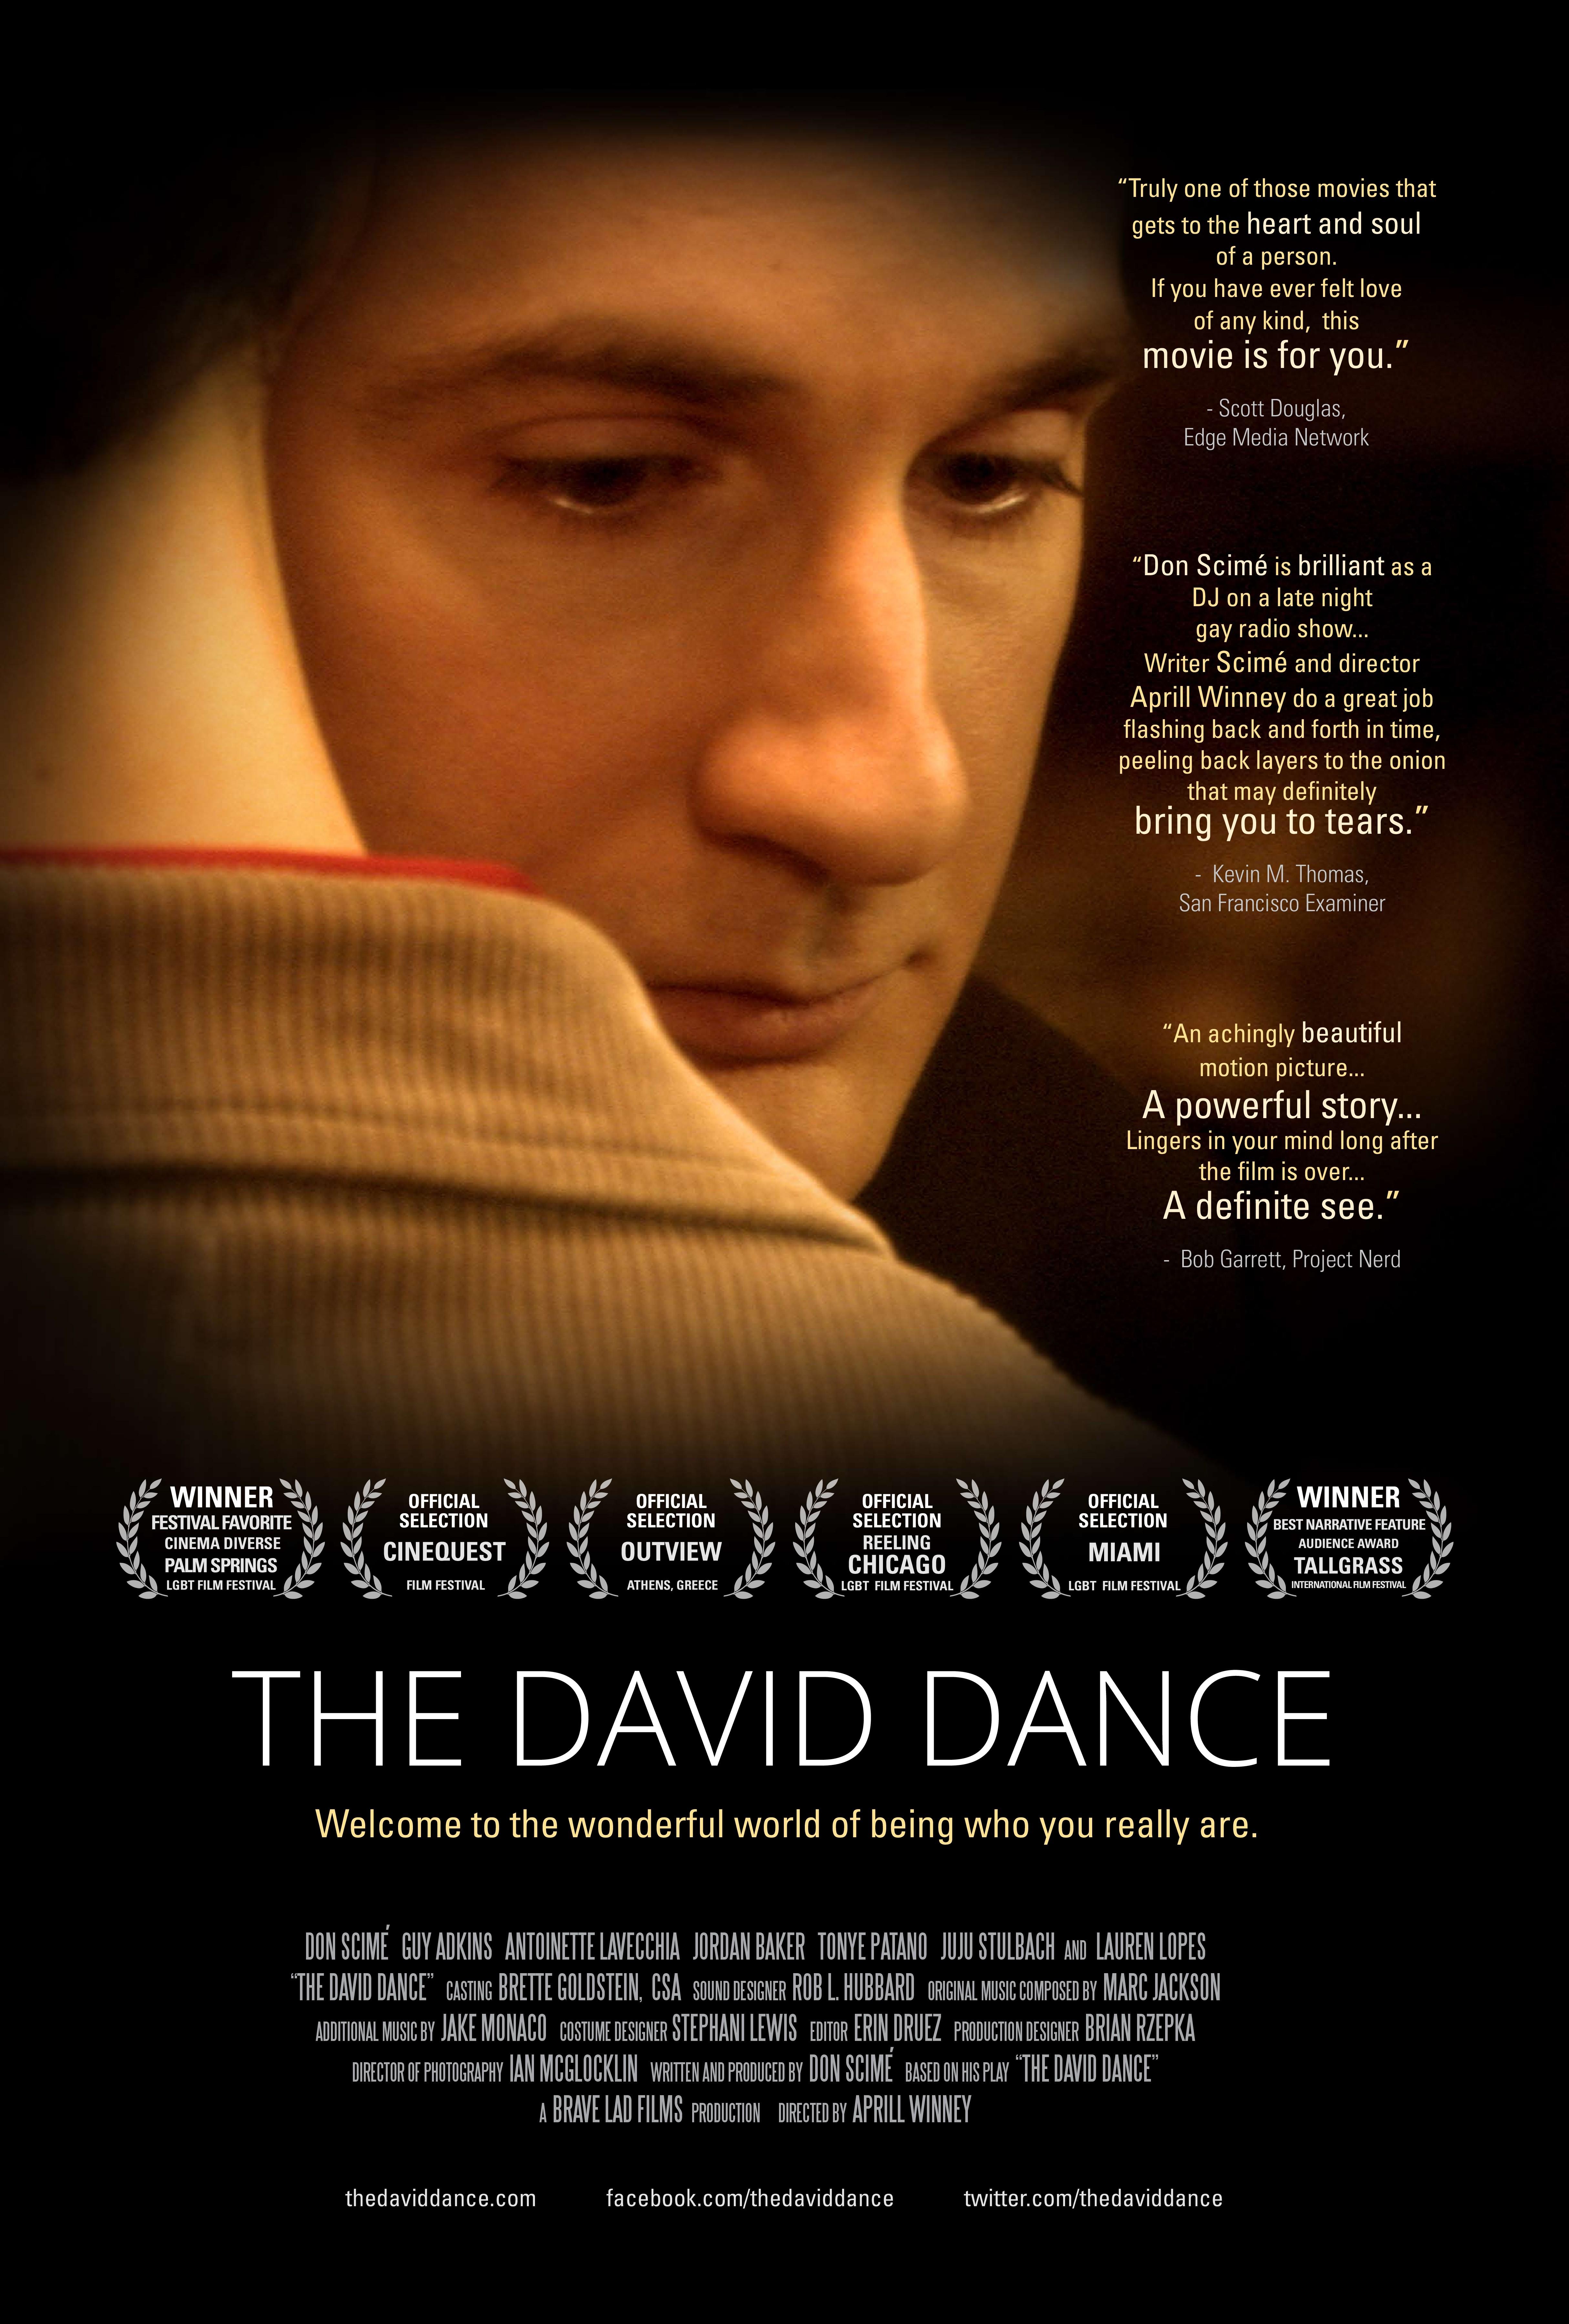 Actor dancer homosexual adoption